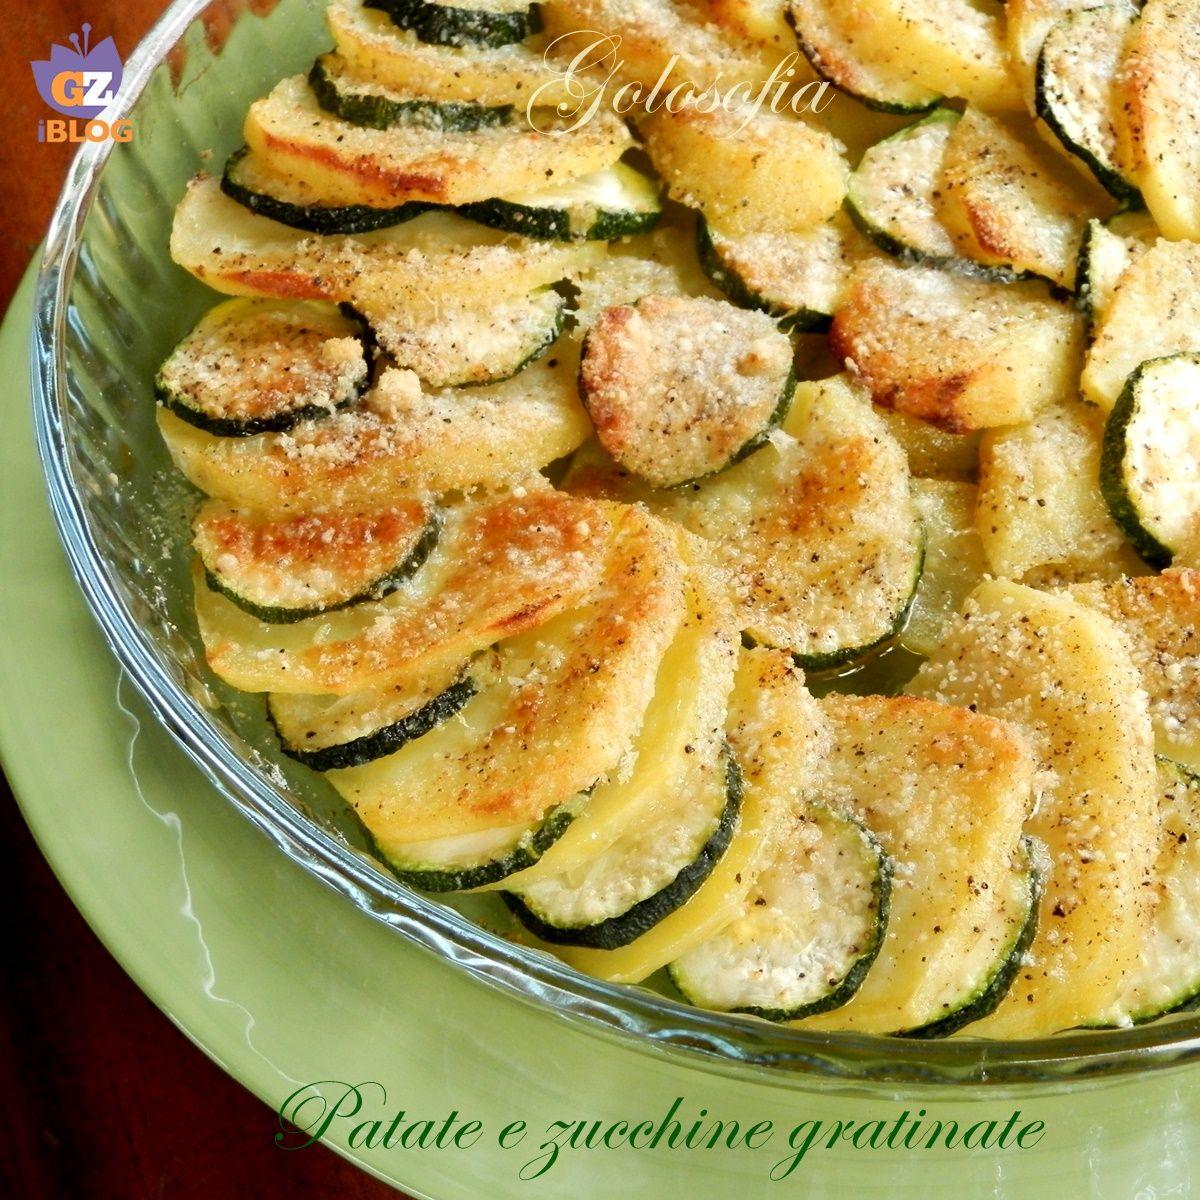 1d0c5ba45708e0024e2a2a3f2219e5fe - Ricette Con Zucchine E Patate